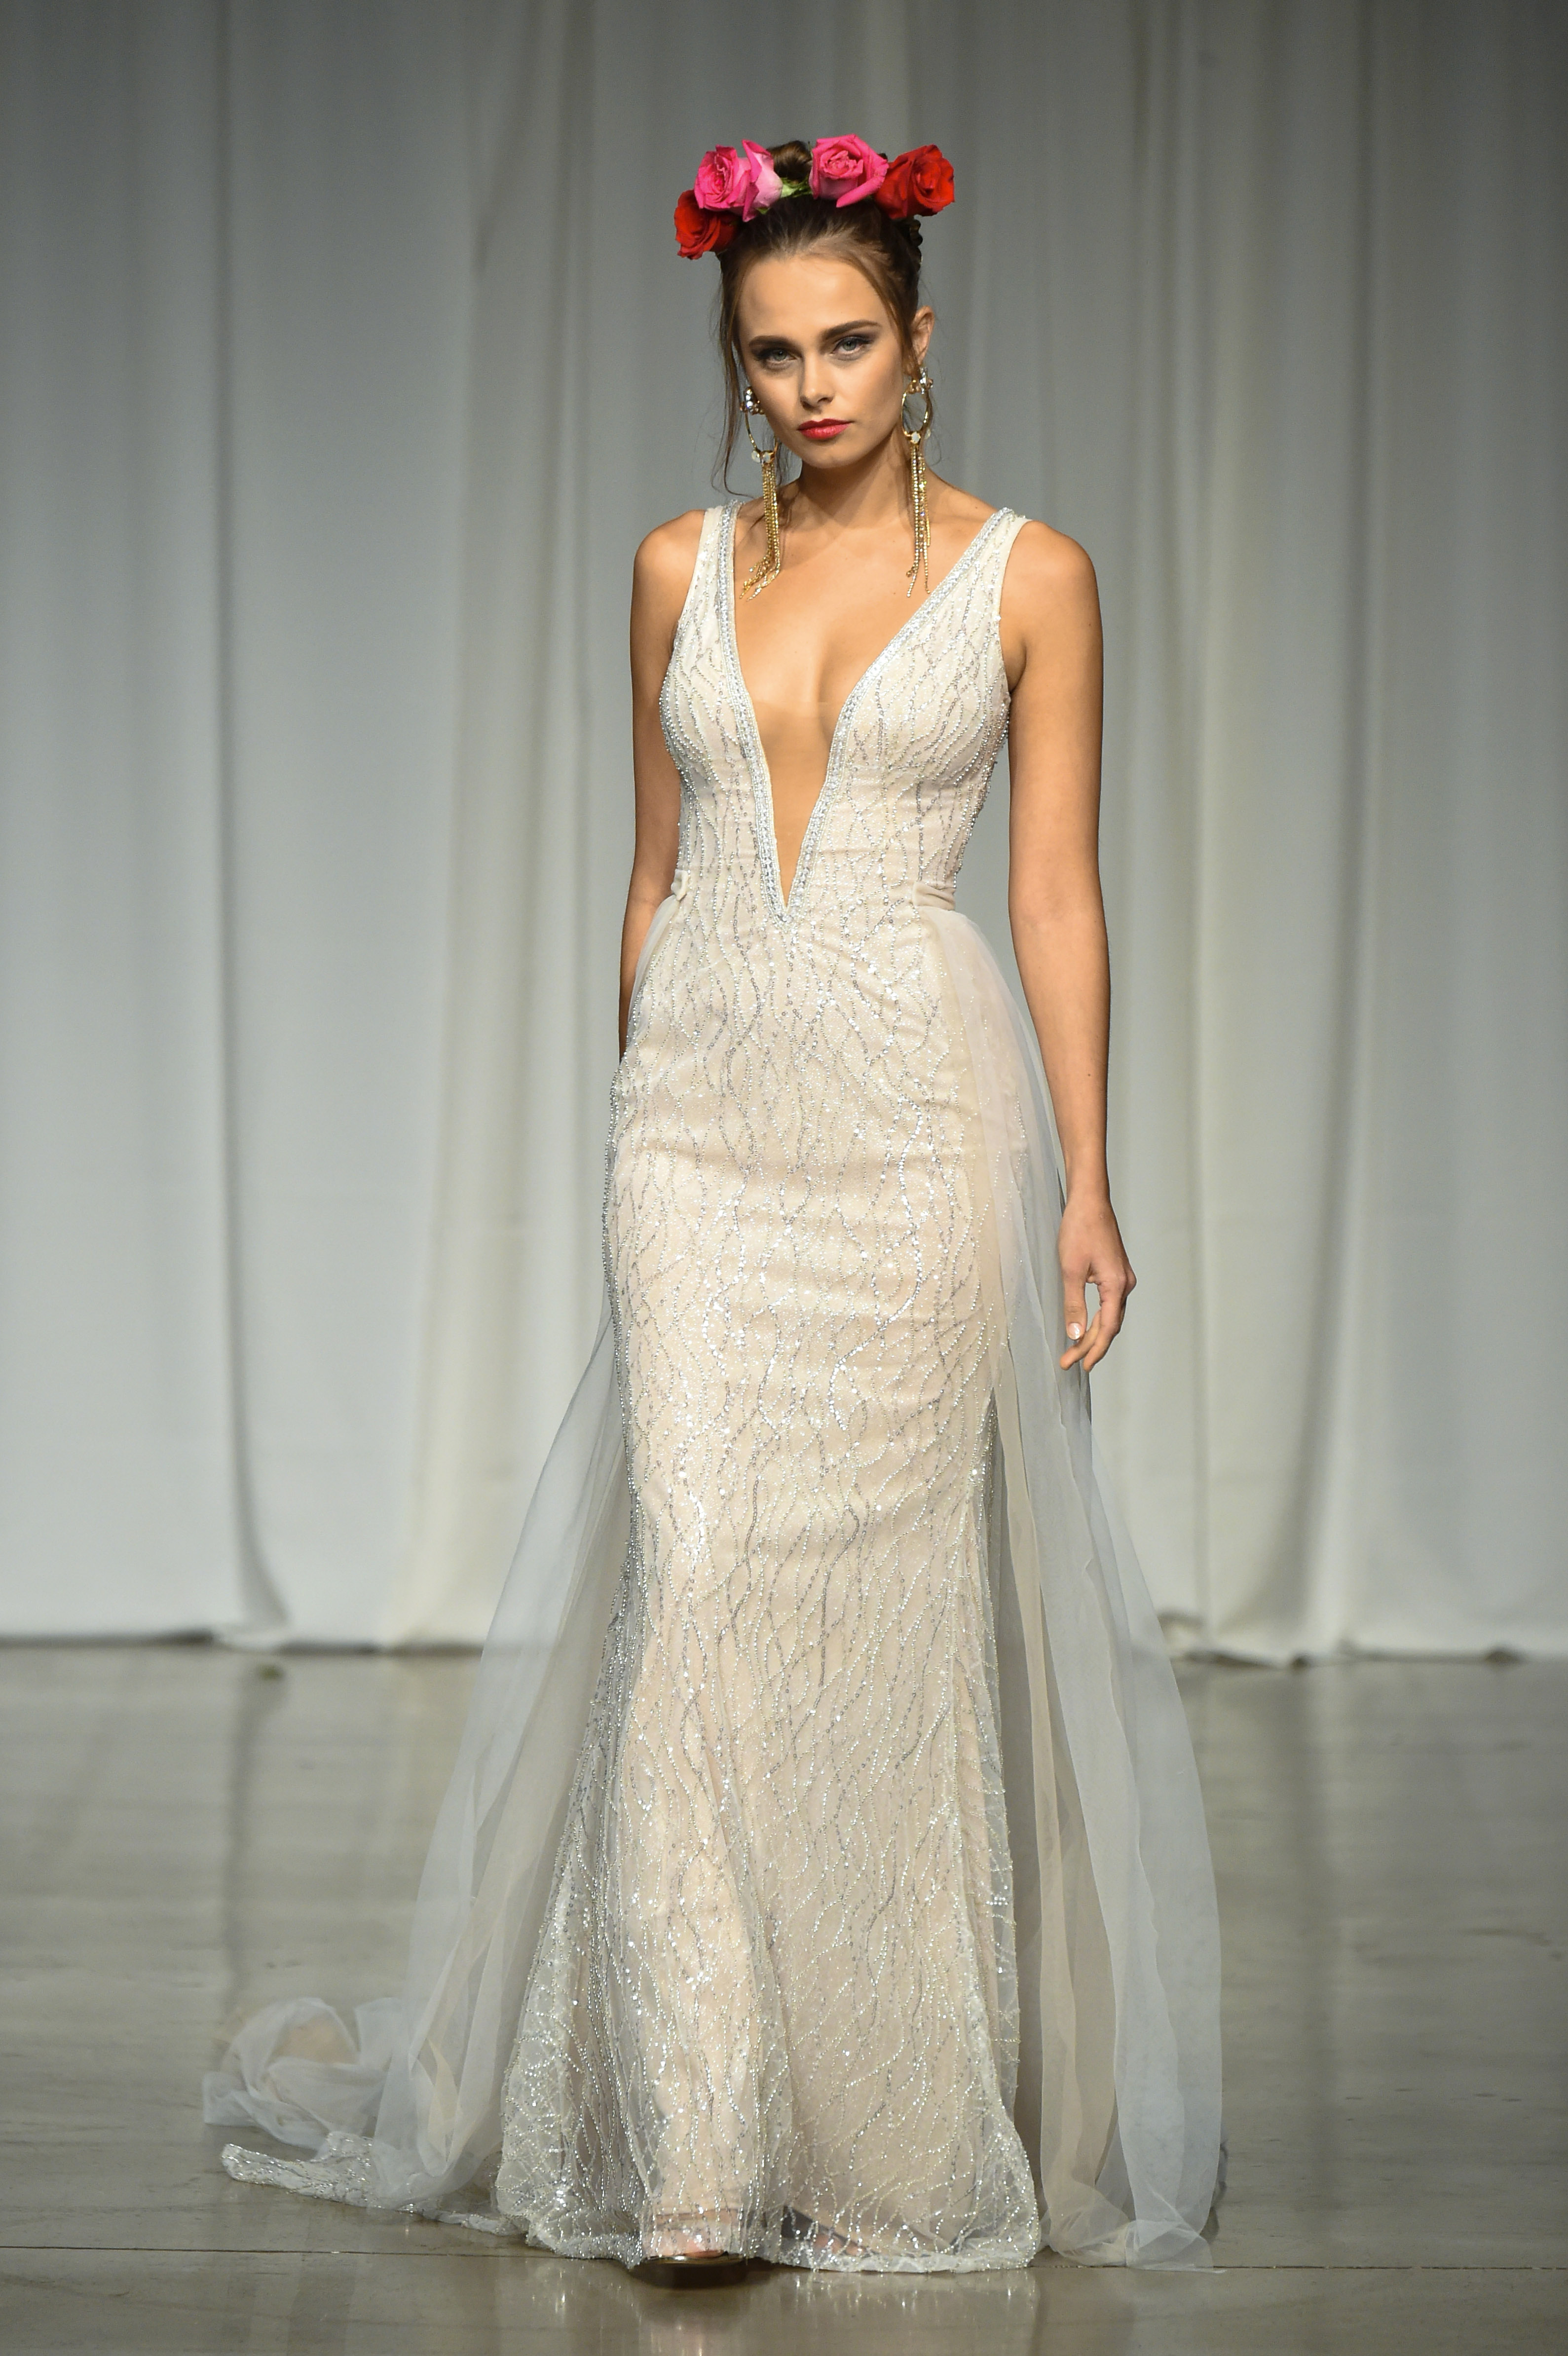 julie vino group fall 2019 sheath v-neck glitter wedding dress